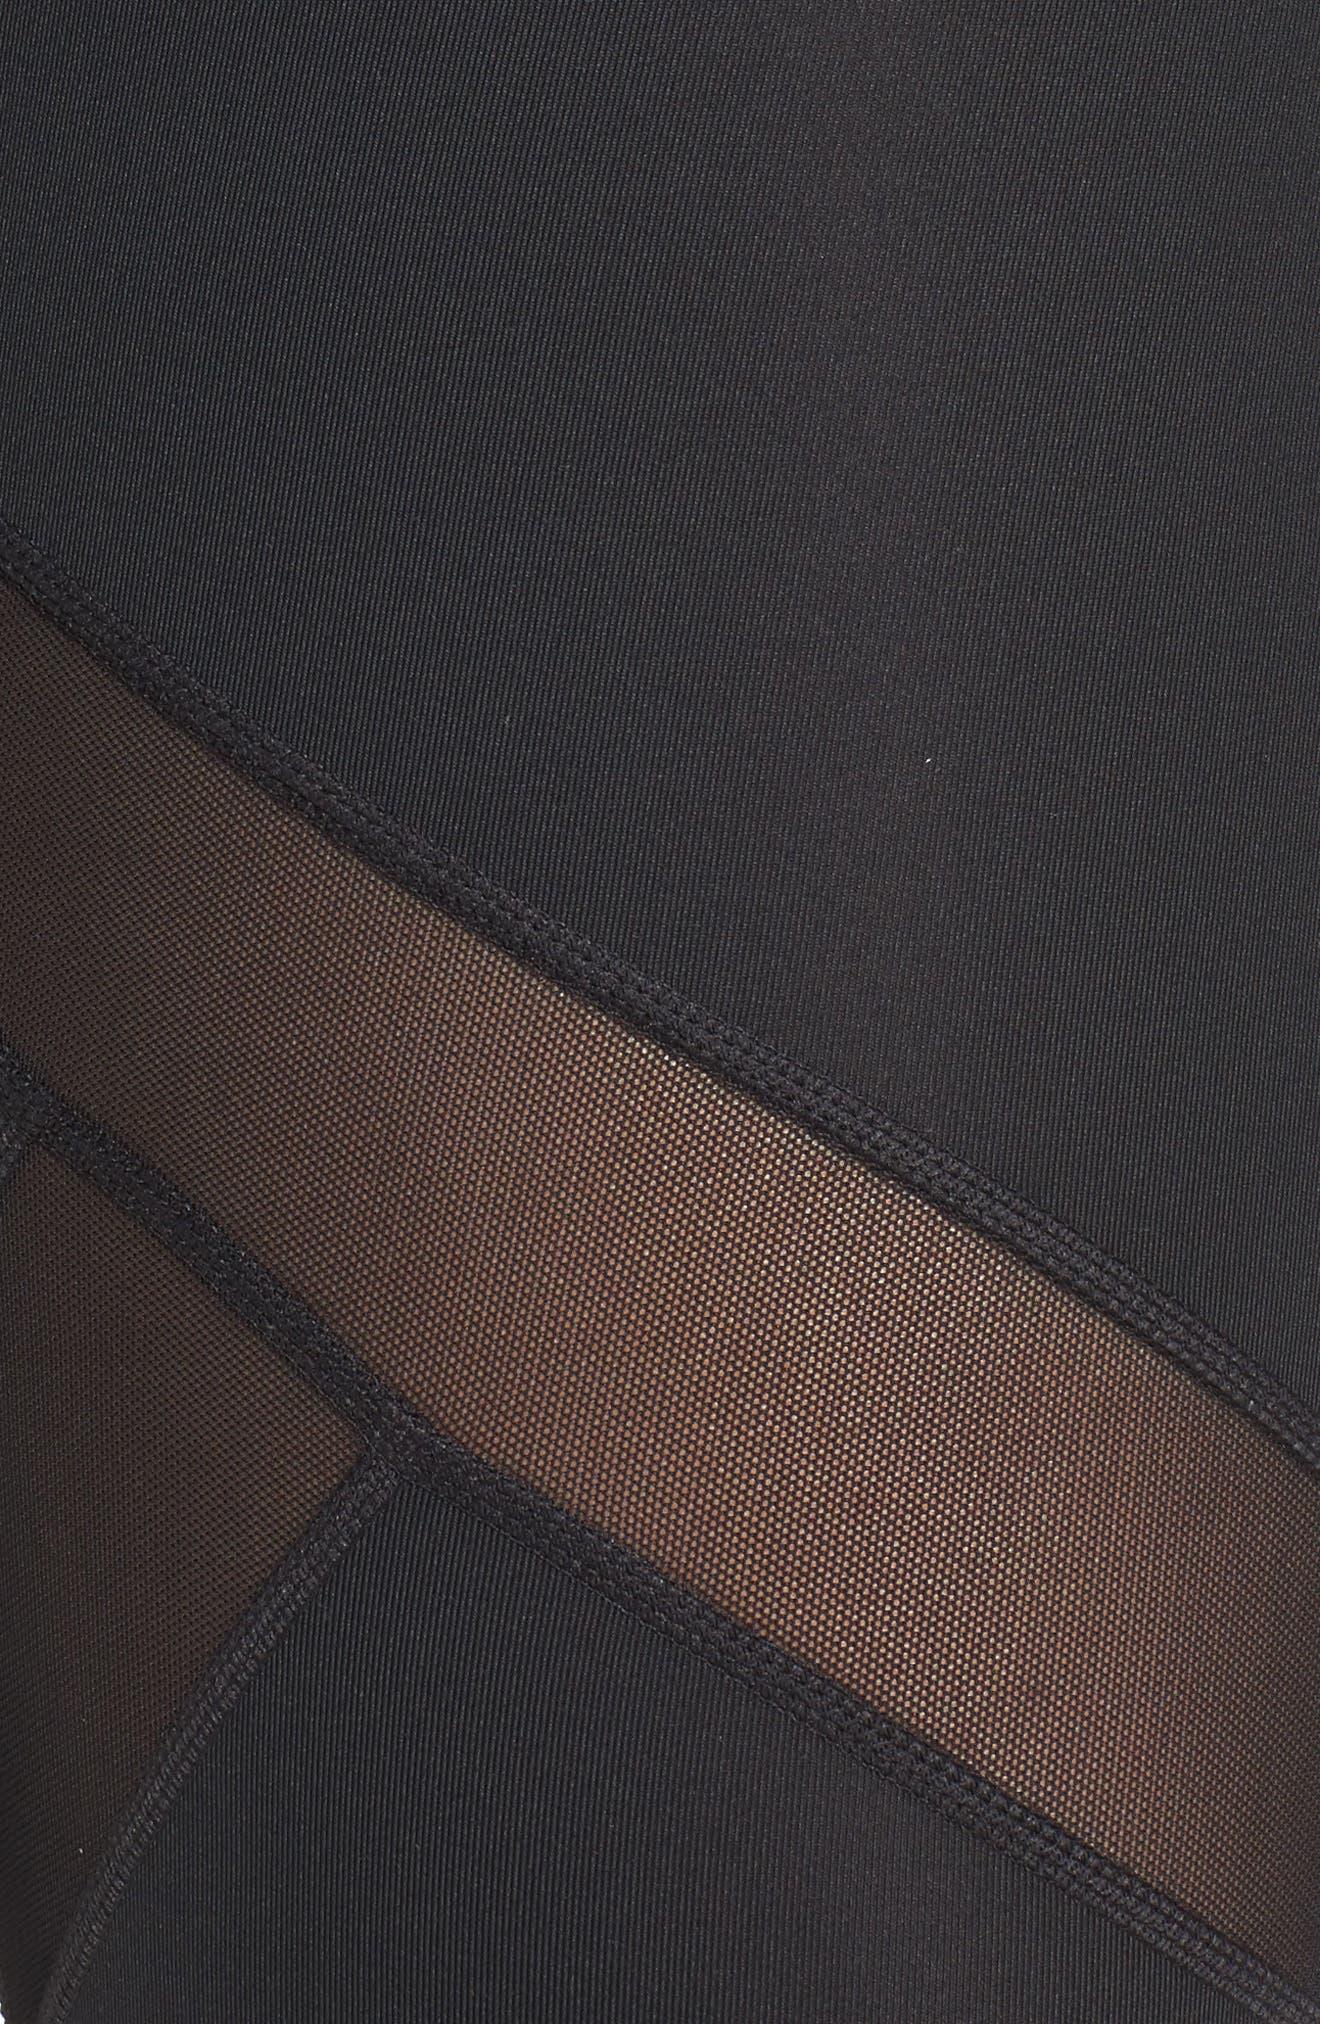 Sprint Crop Leggings,                             Alternate thumbnail 4, color,                             Black